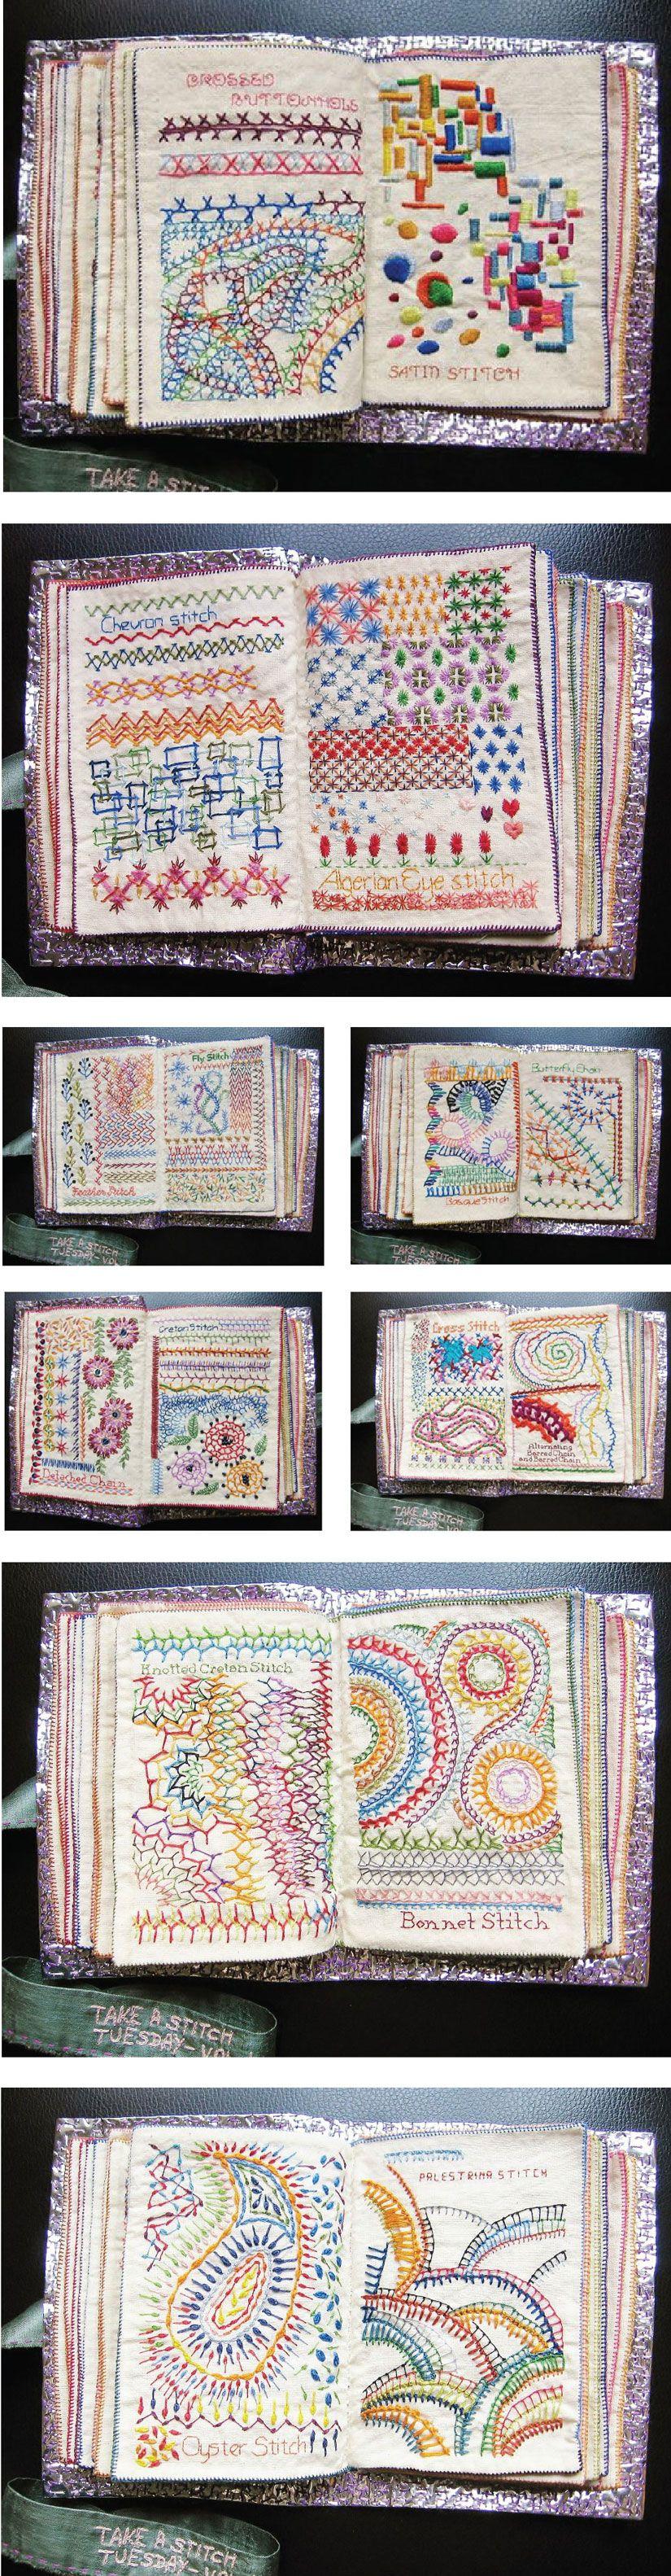 Admiring The Embroidered Fabric Book Created By Bangalorebased Stitcher,  Maya Matthew Her